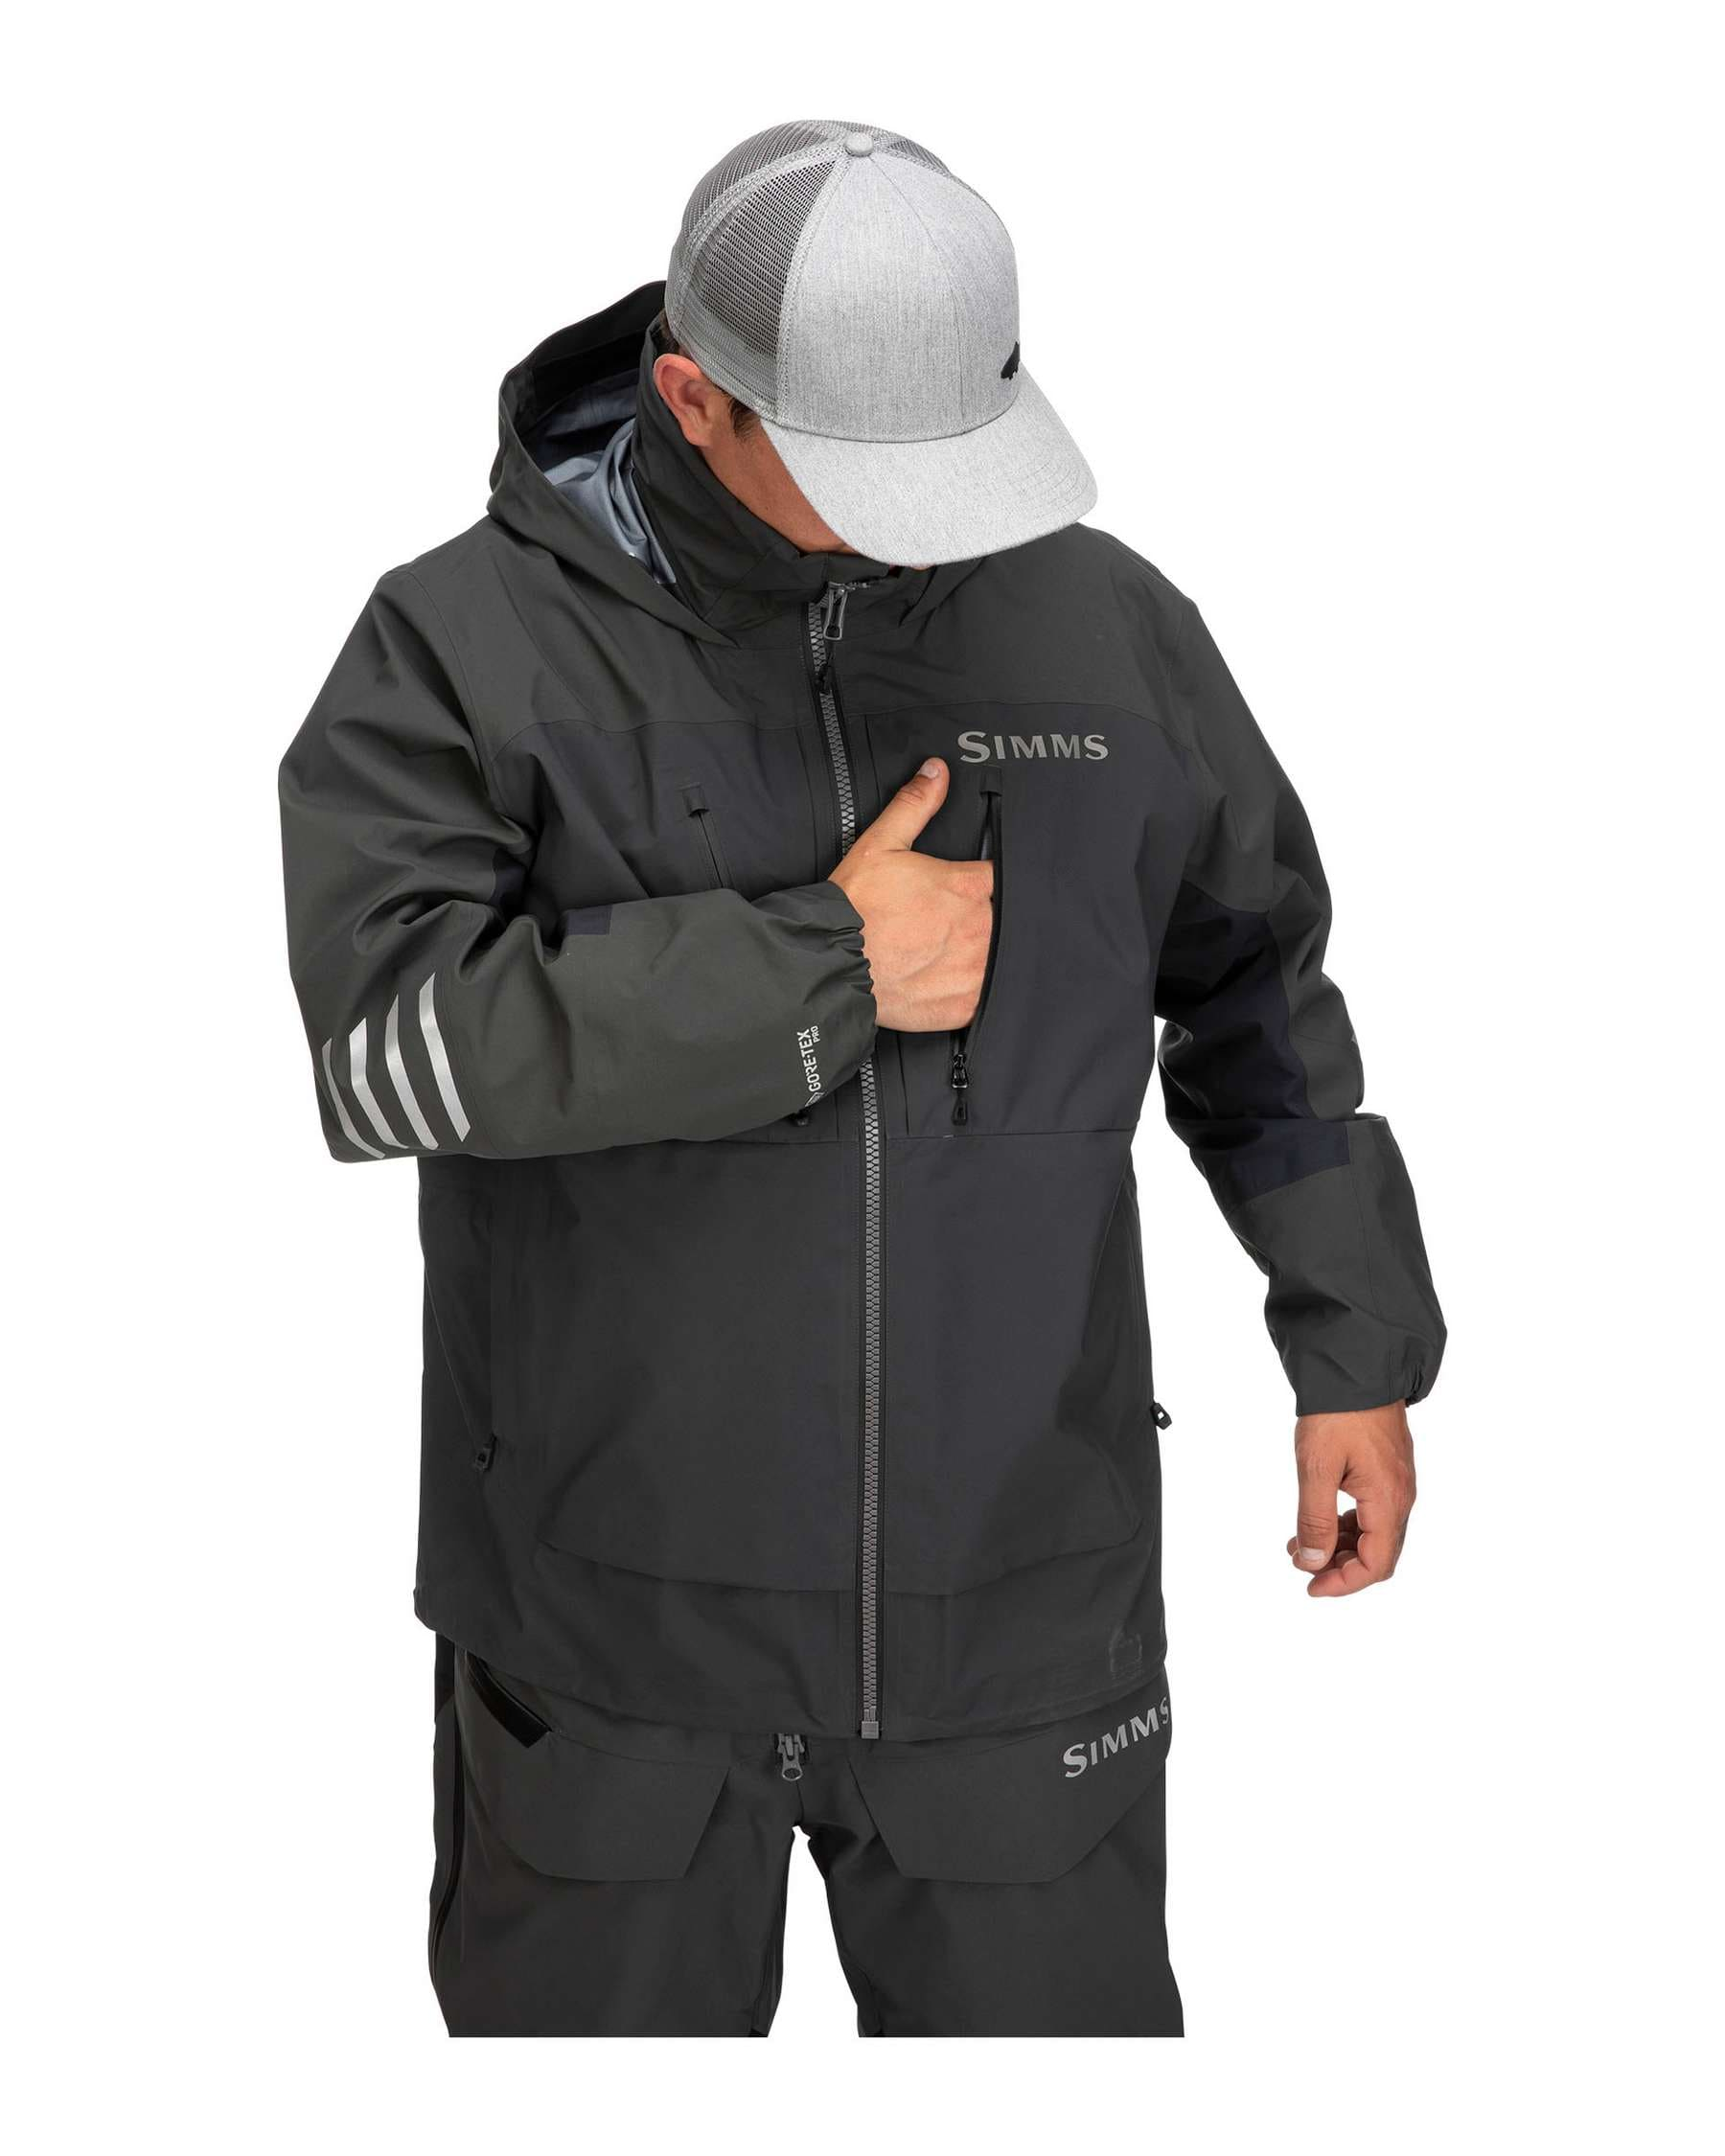 simms-prodry-jacket-chubasquero